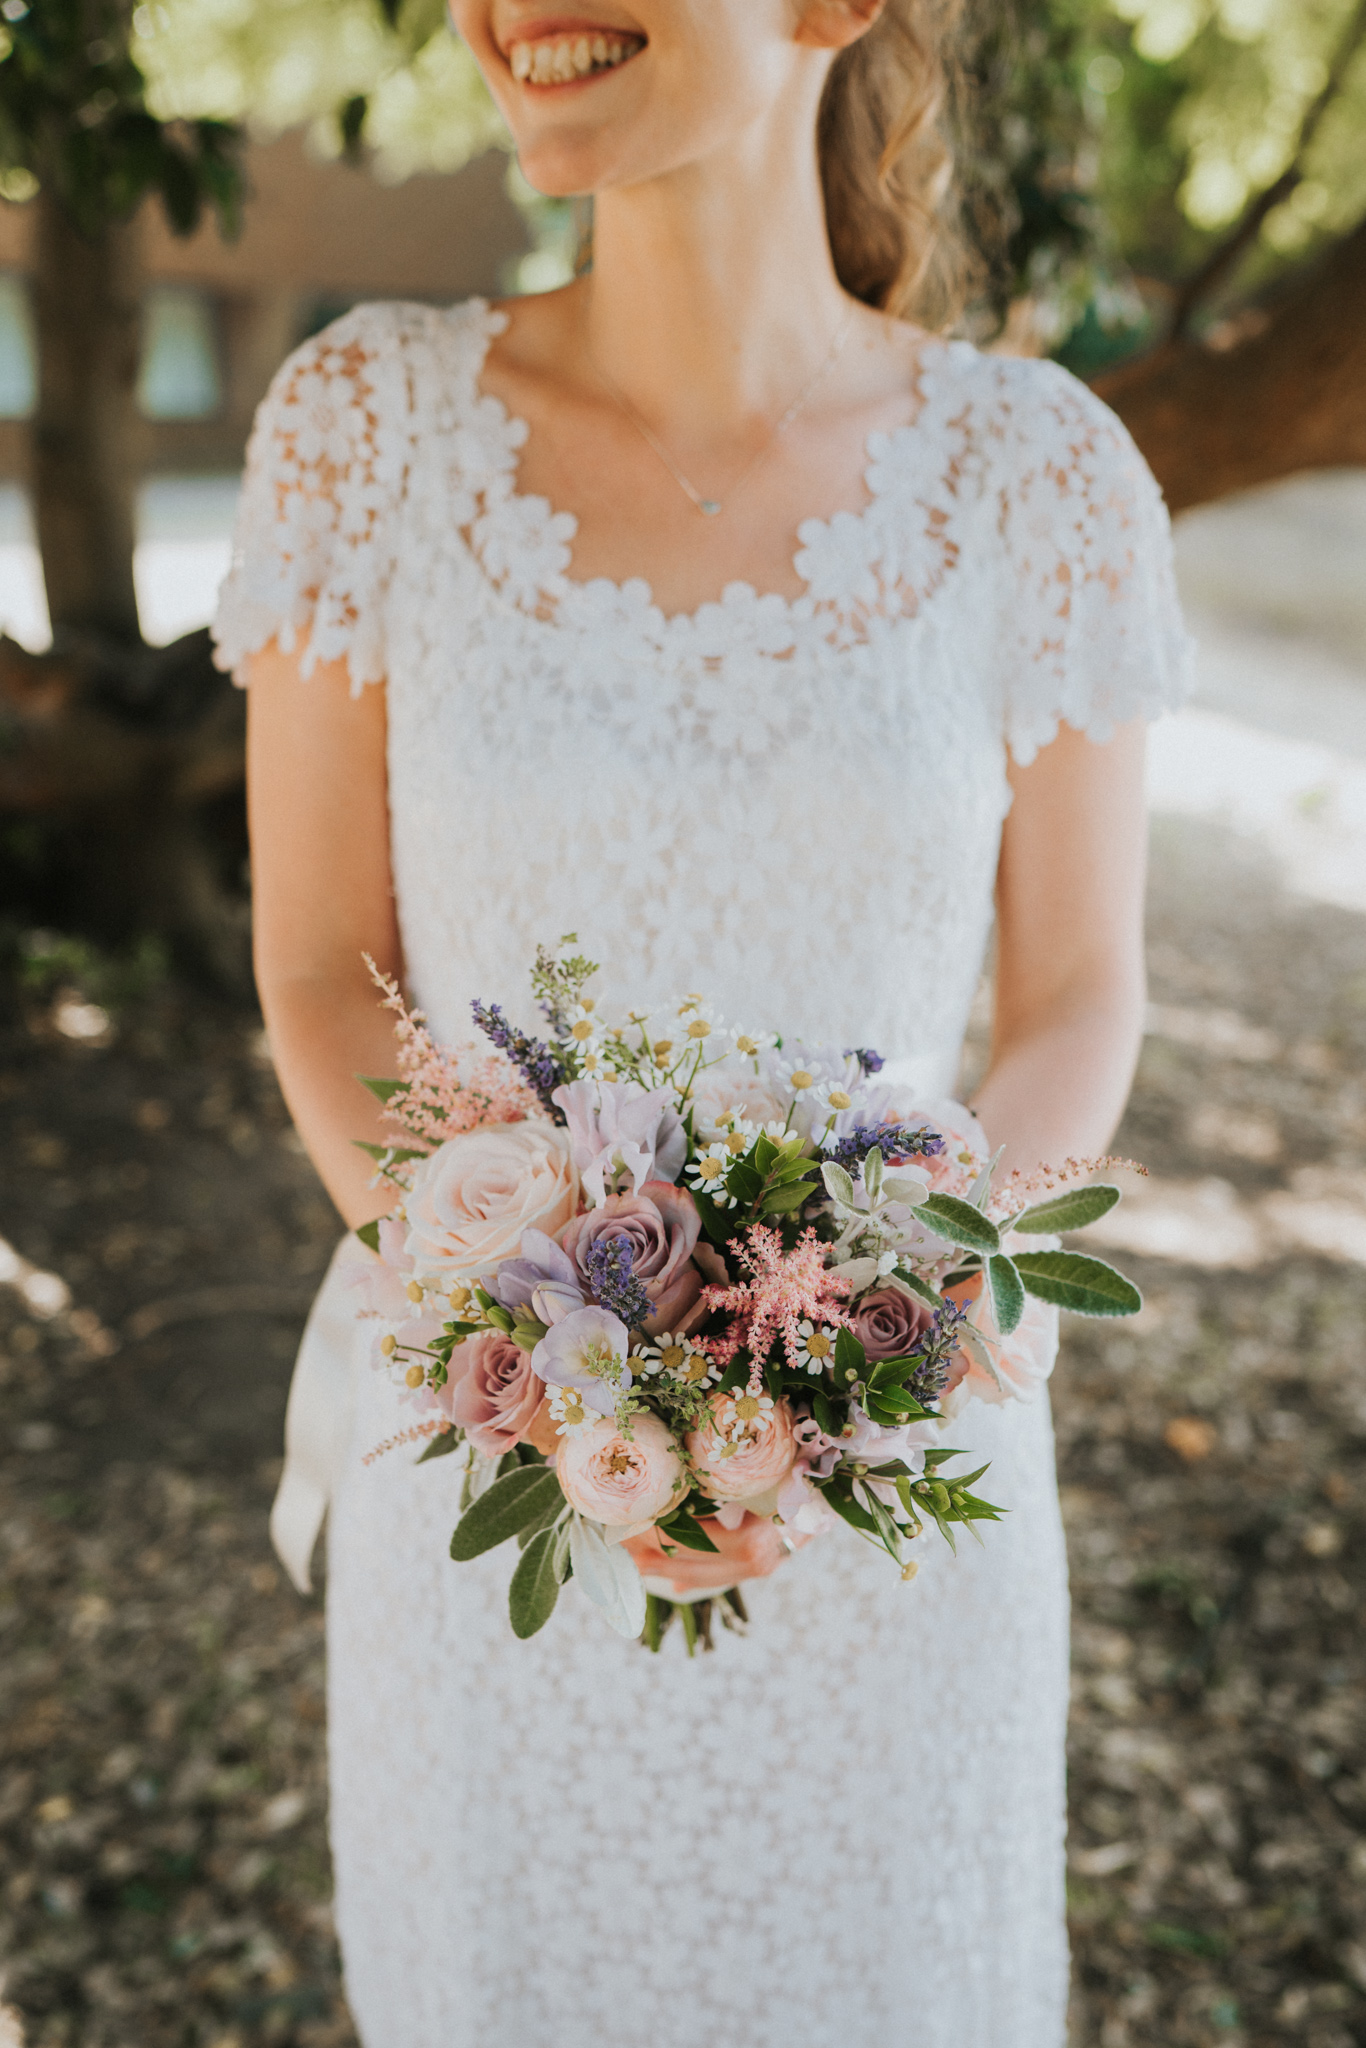 Georgie-Ketu-Firstsite-Wedding-Colchester-Essex-Grace-Elizabeth-Alternative-Wedding-Photographer (20 of 20).jpg